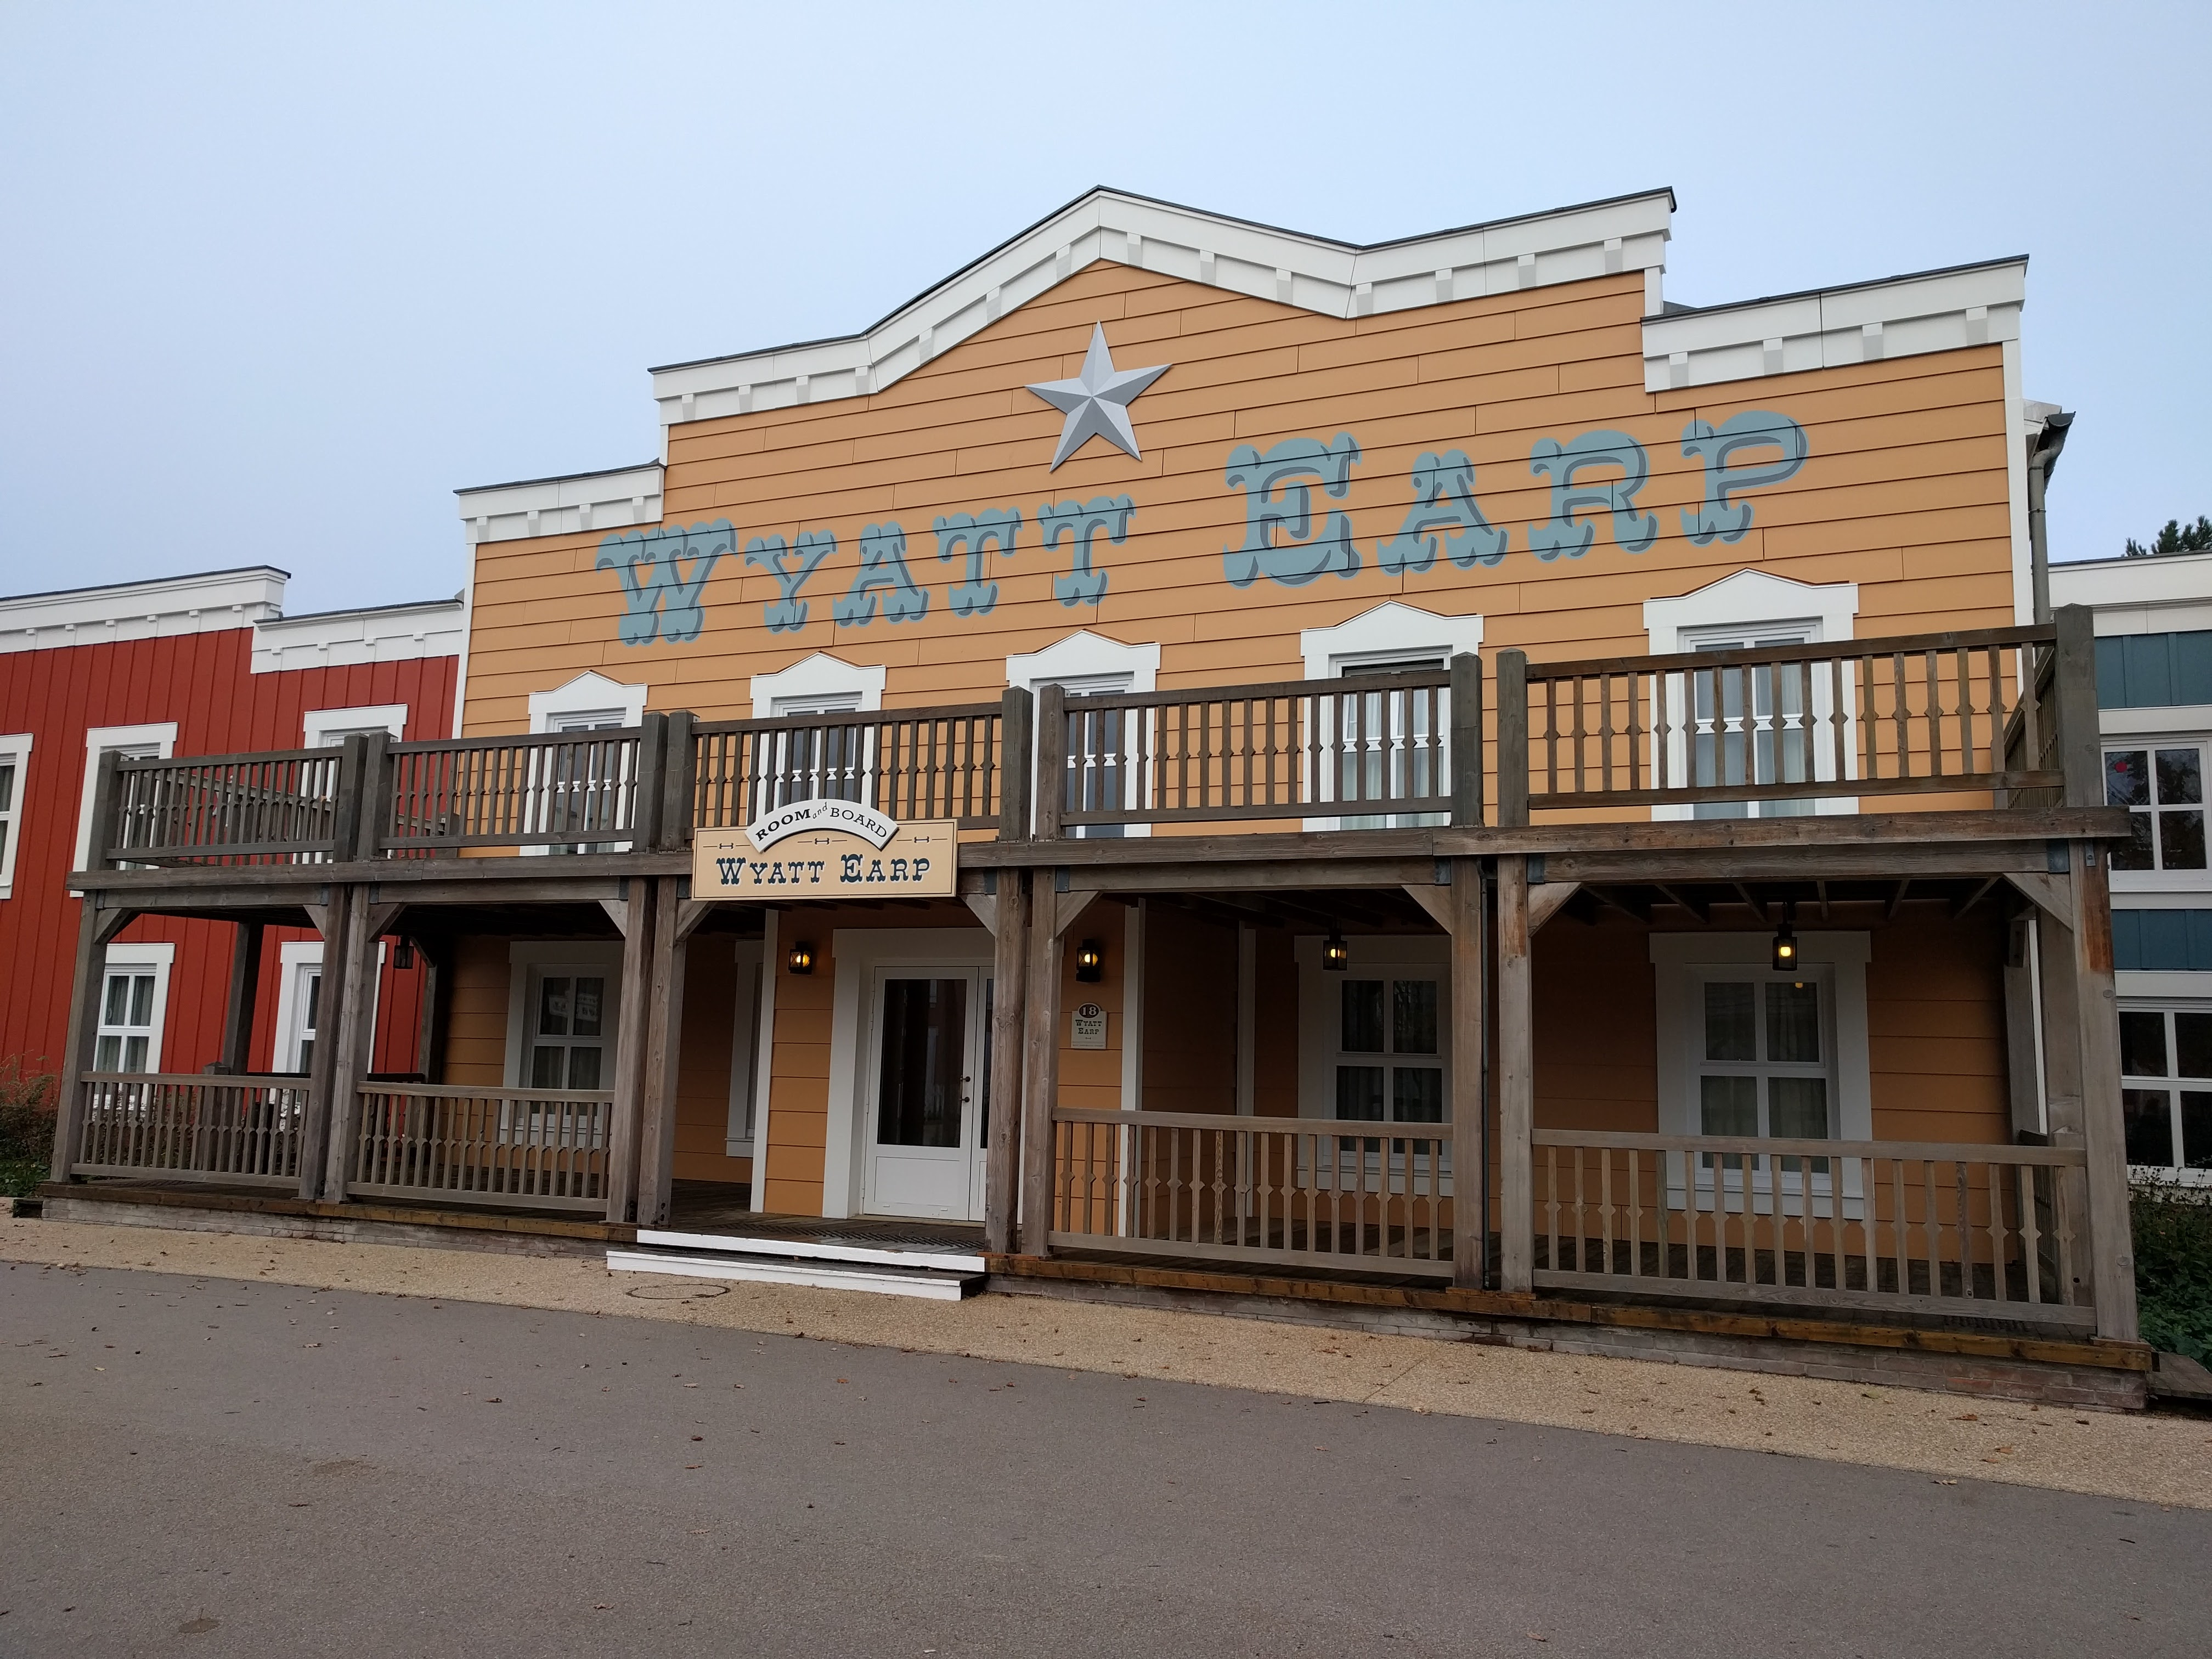 Hotel Cheyenne Building 18 Wyatt Earp